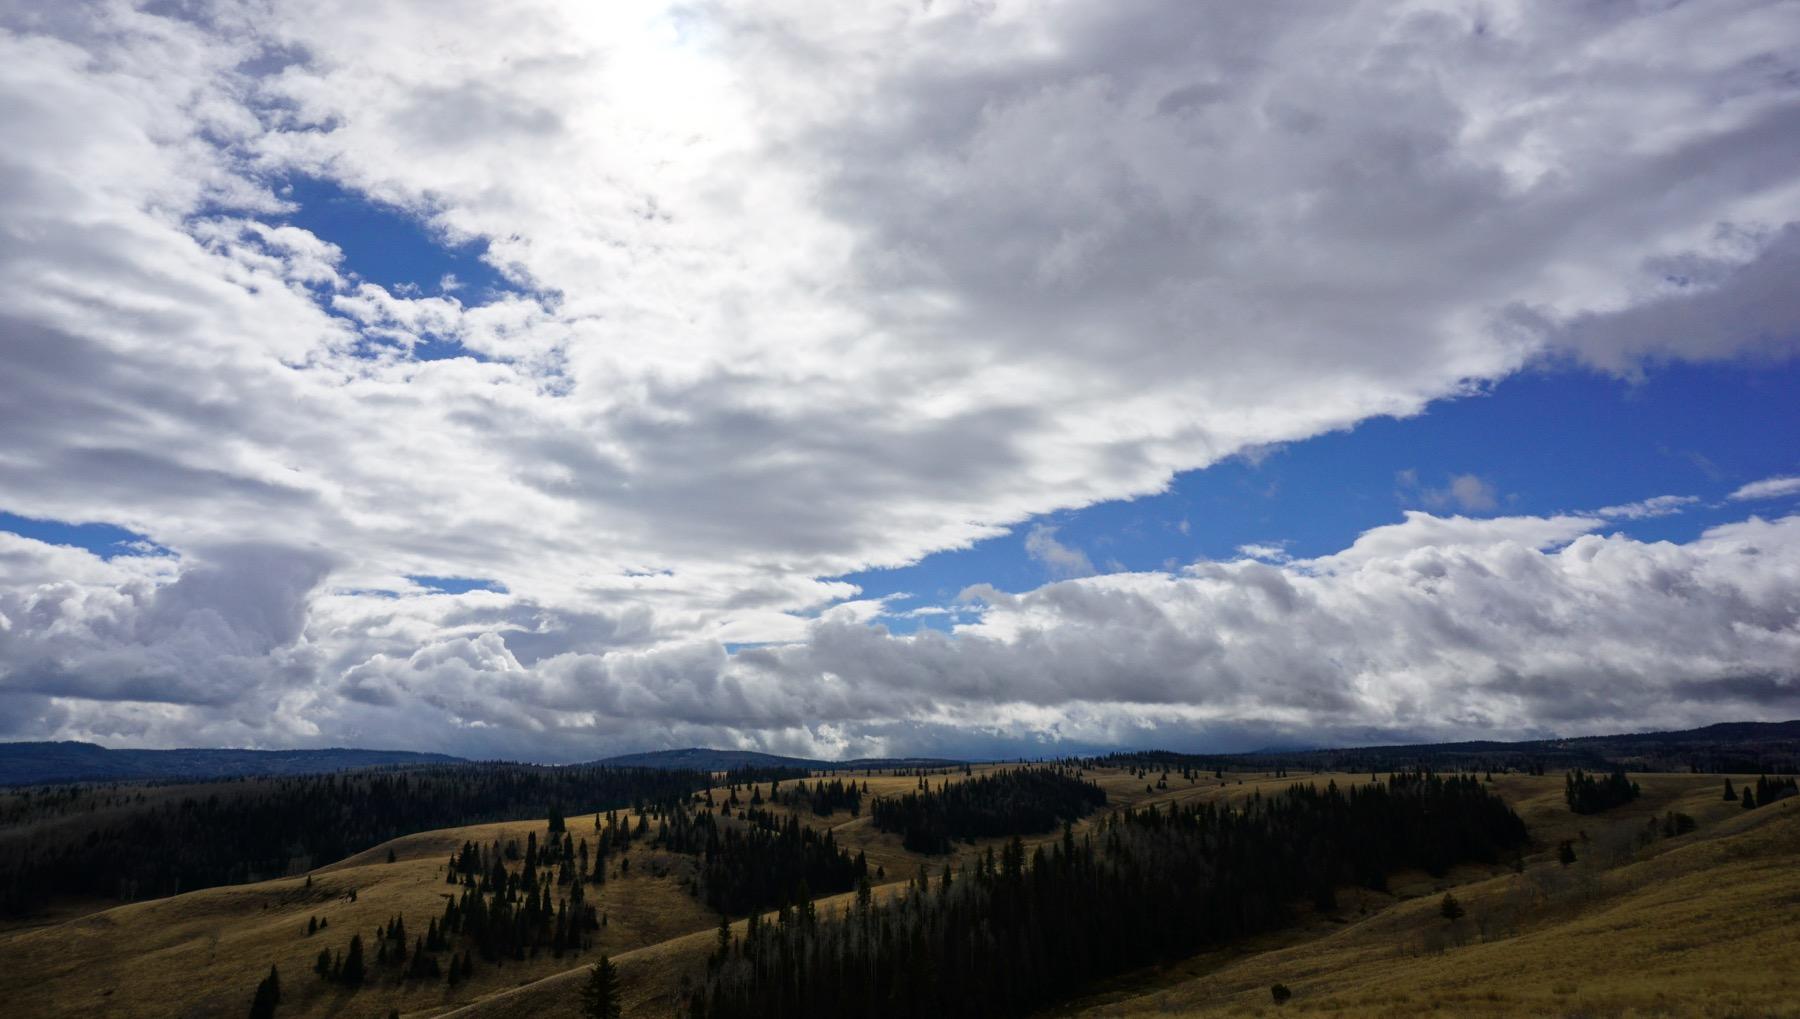 A Ridge Line Hike, A Lingering End